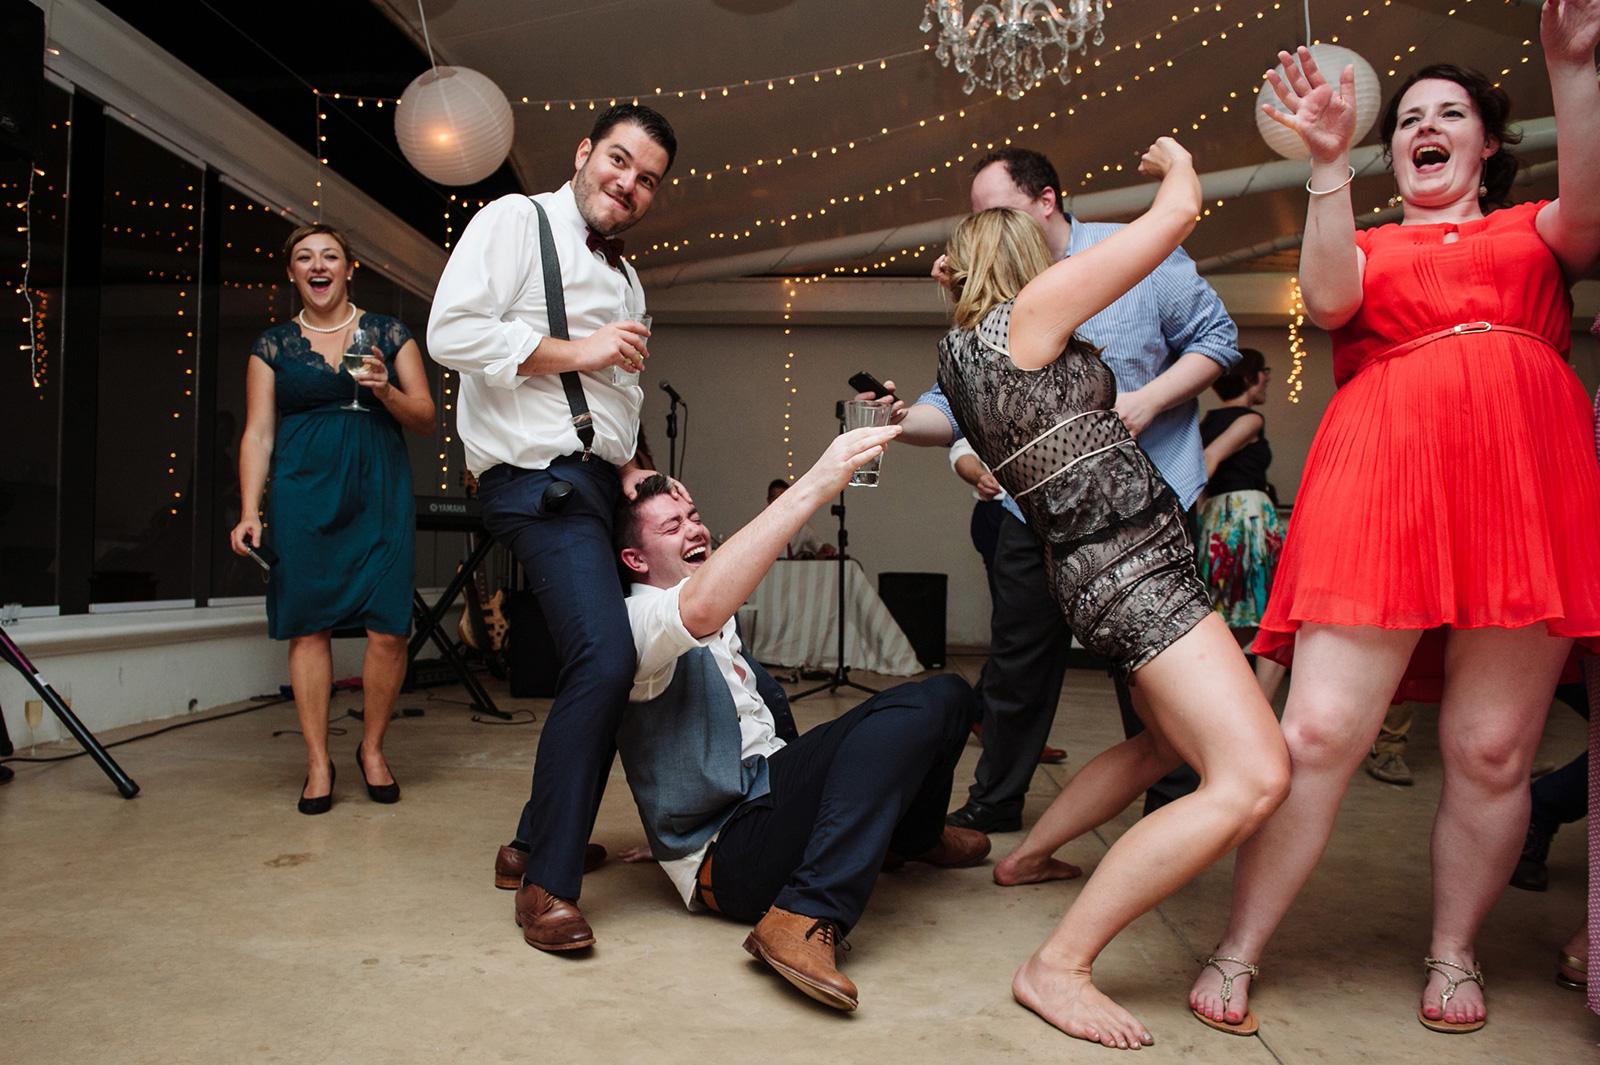 Drunk dancing at weddings